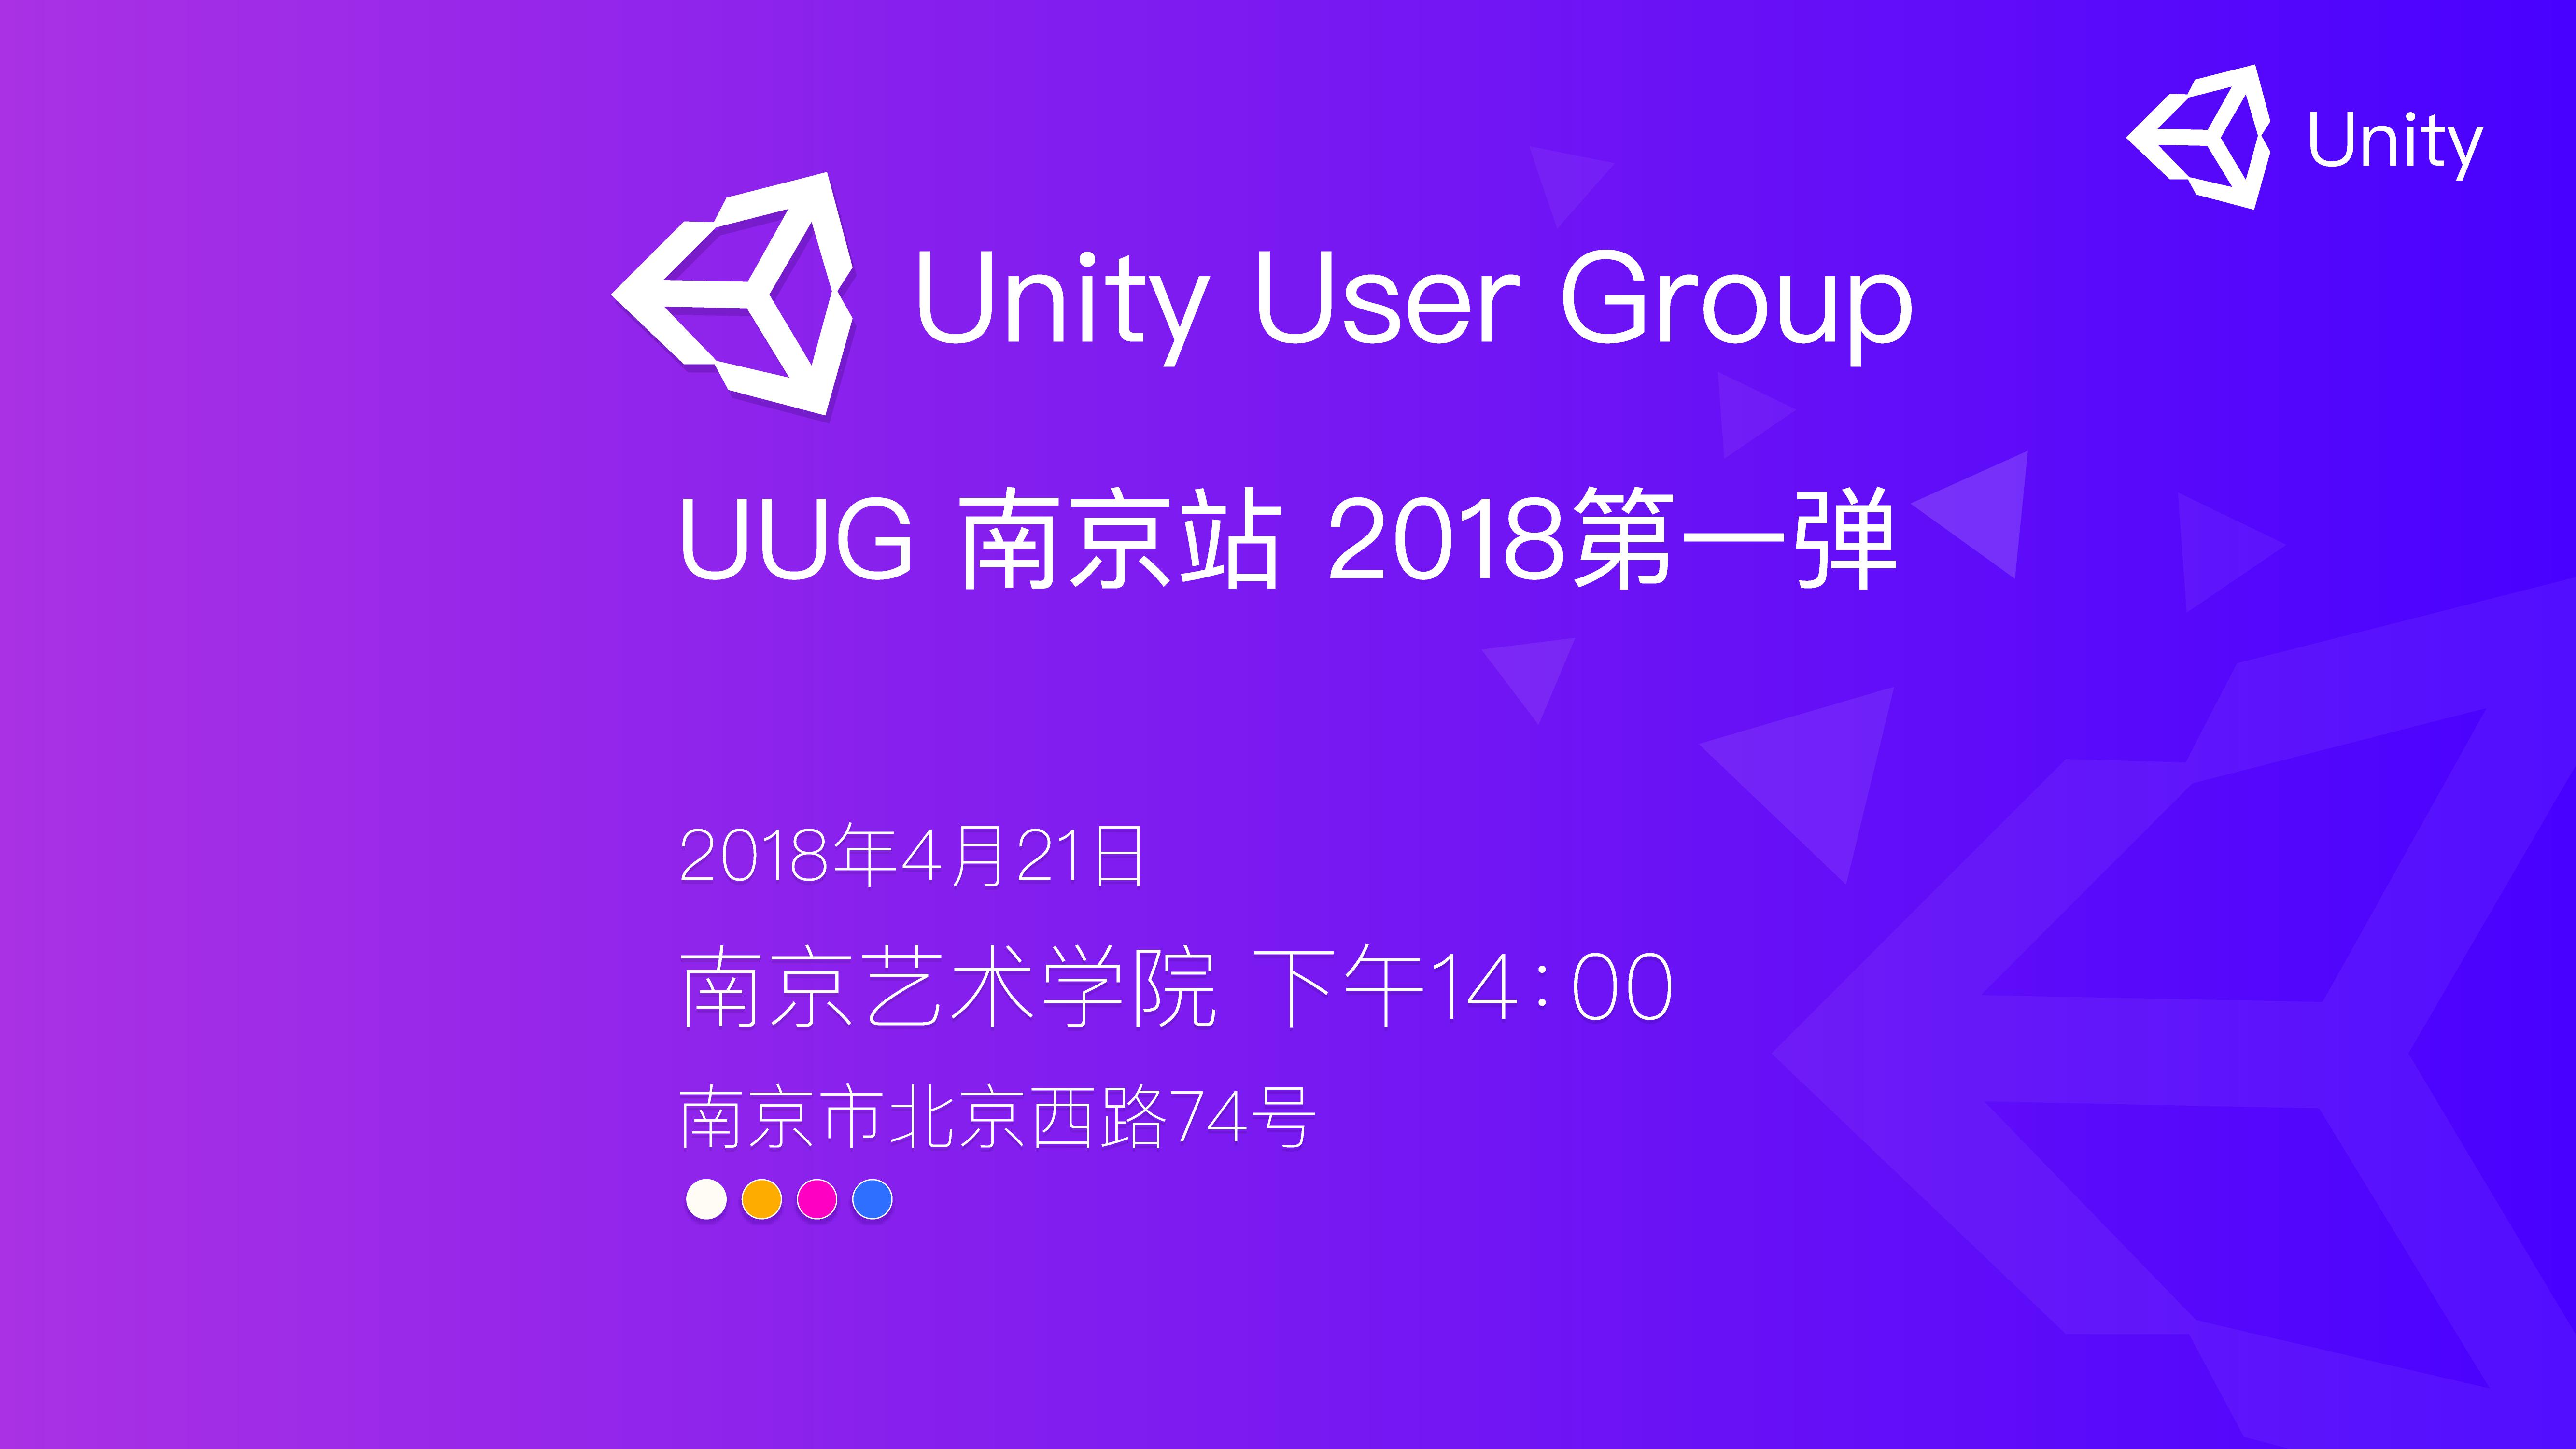 UUG南京站 2018.4.21 技术分享